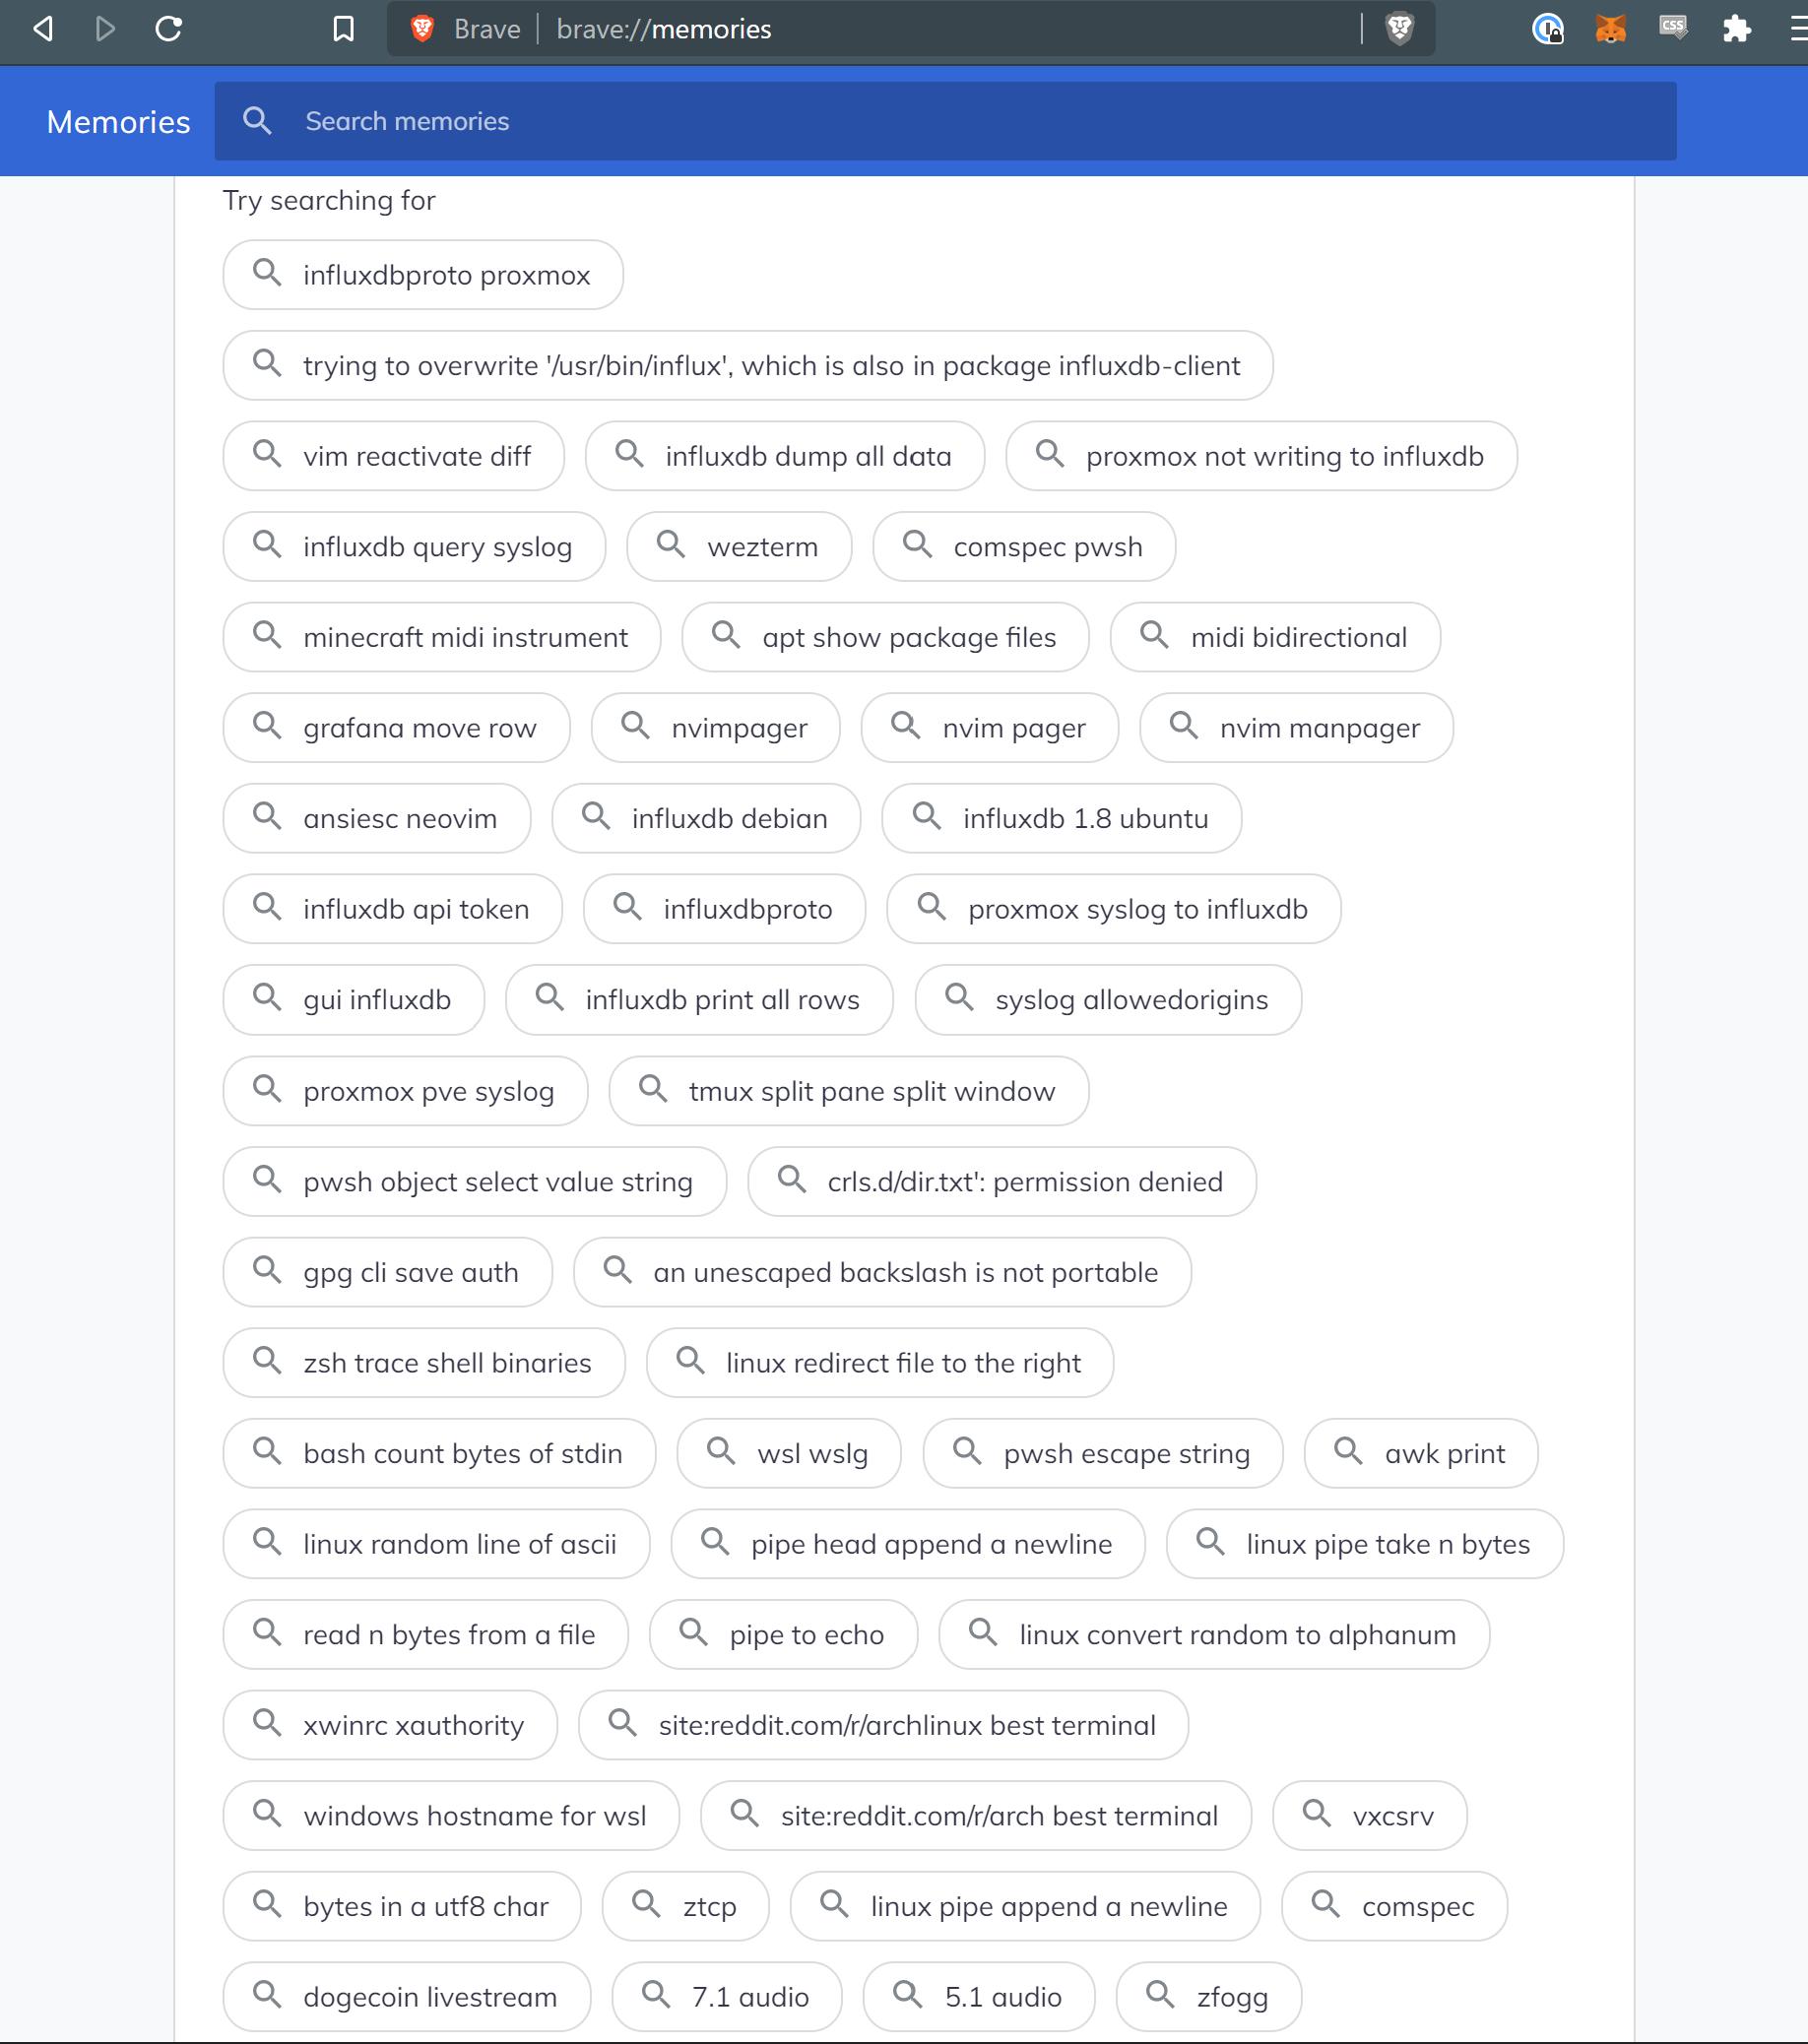 https://cloud-bd97kxwp0-hack-club-bot.vercel.app/0image.png